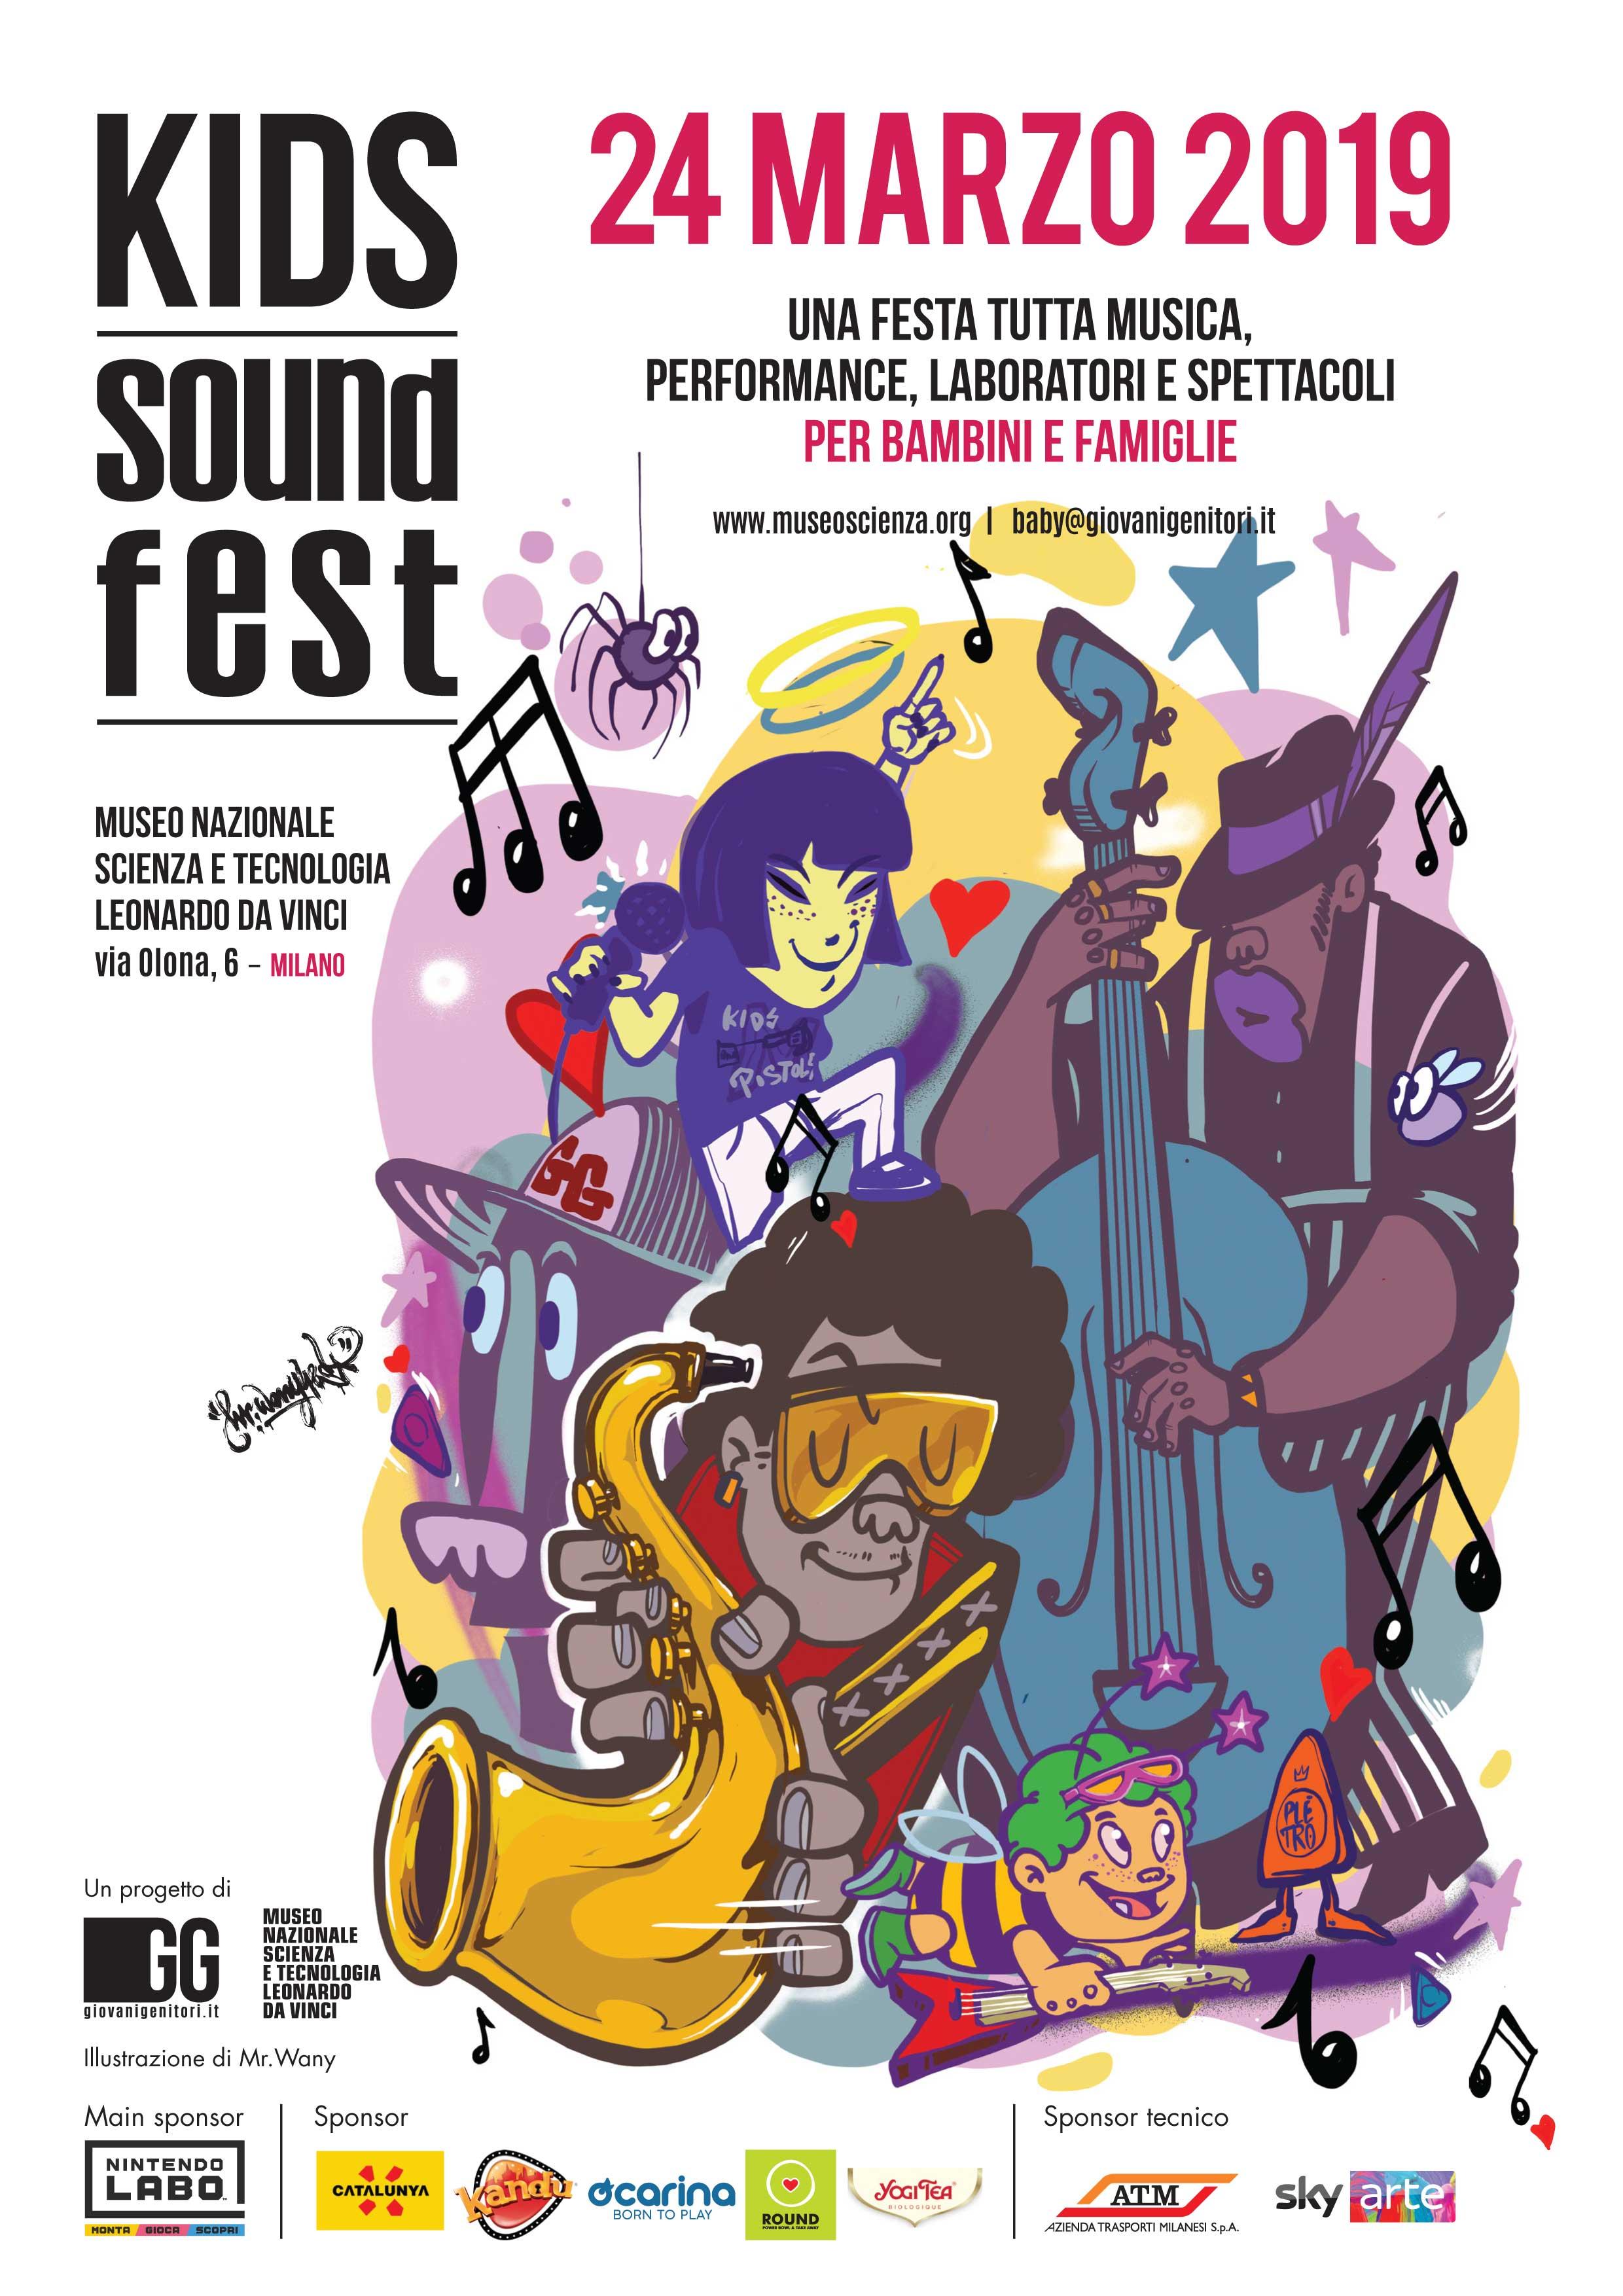 Kids Sound Fest 2019 Milano locandina